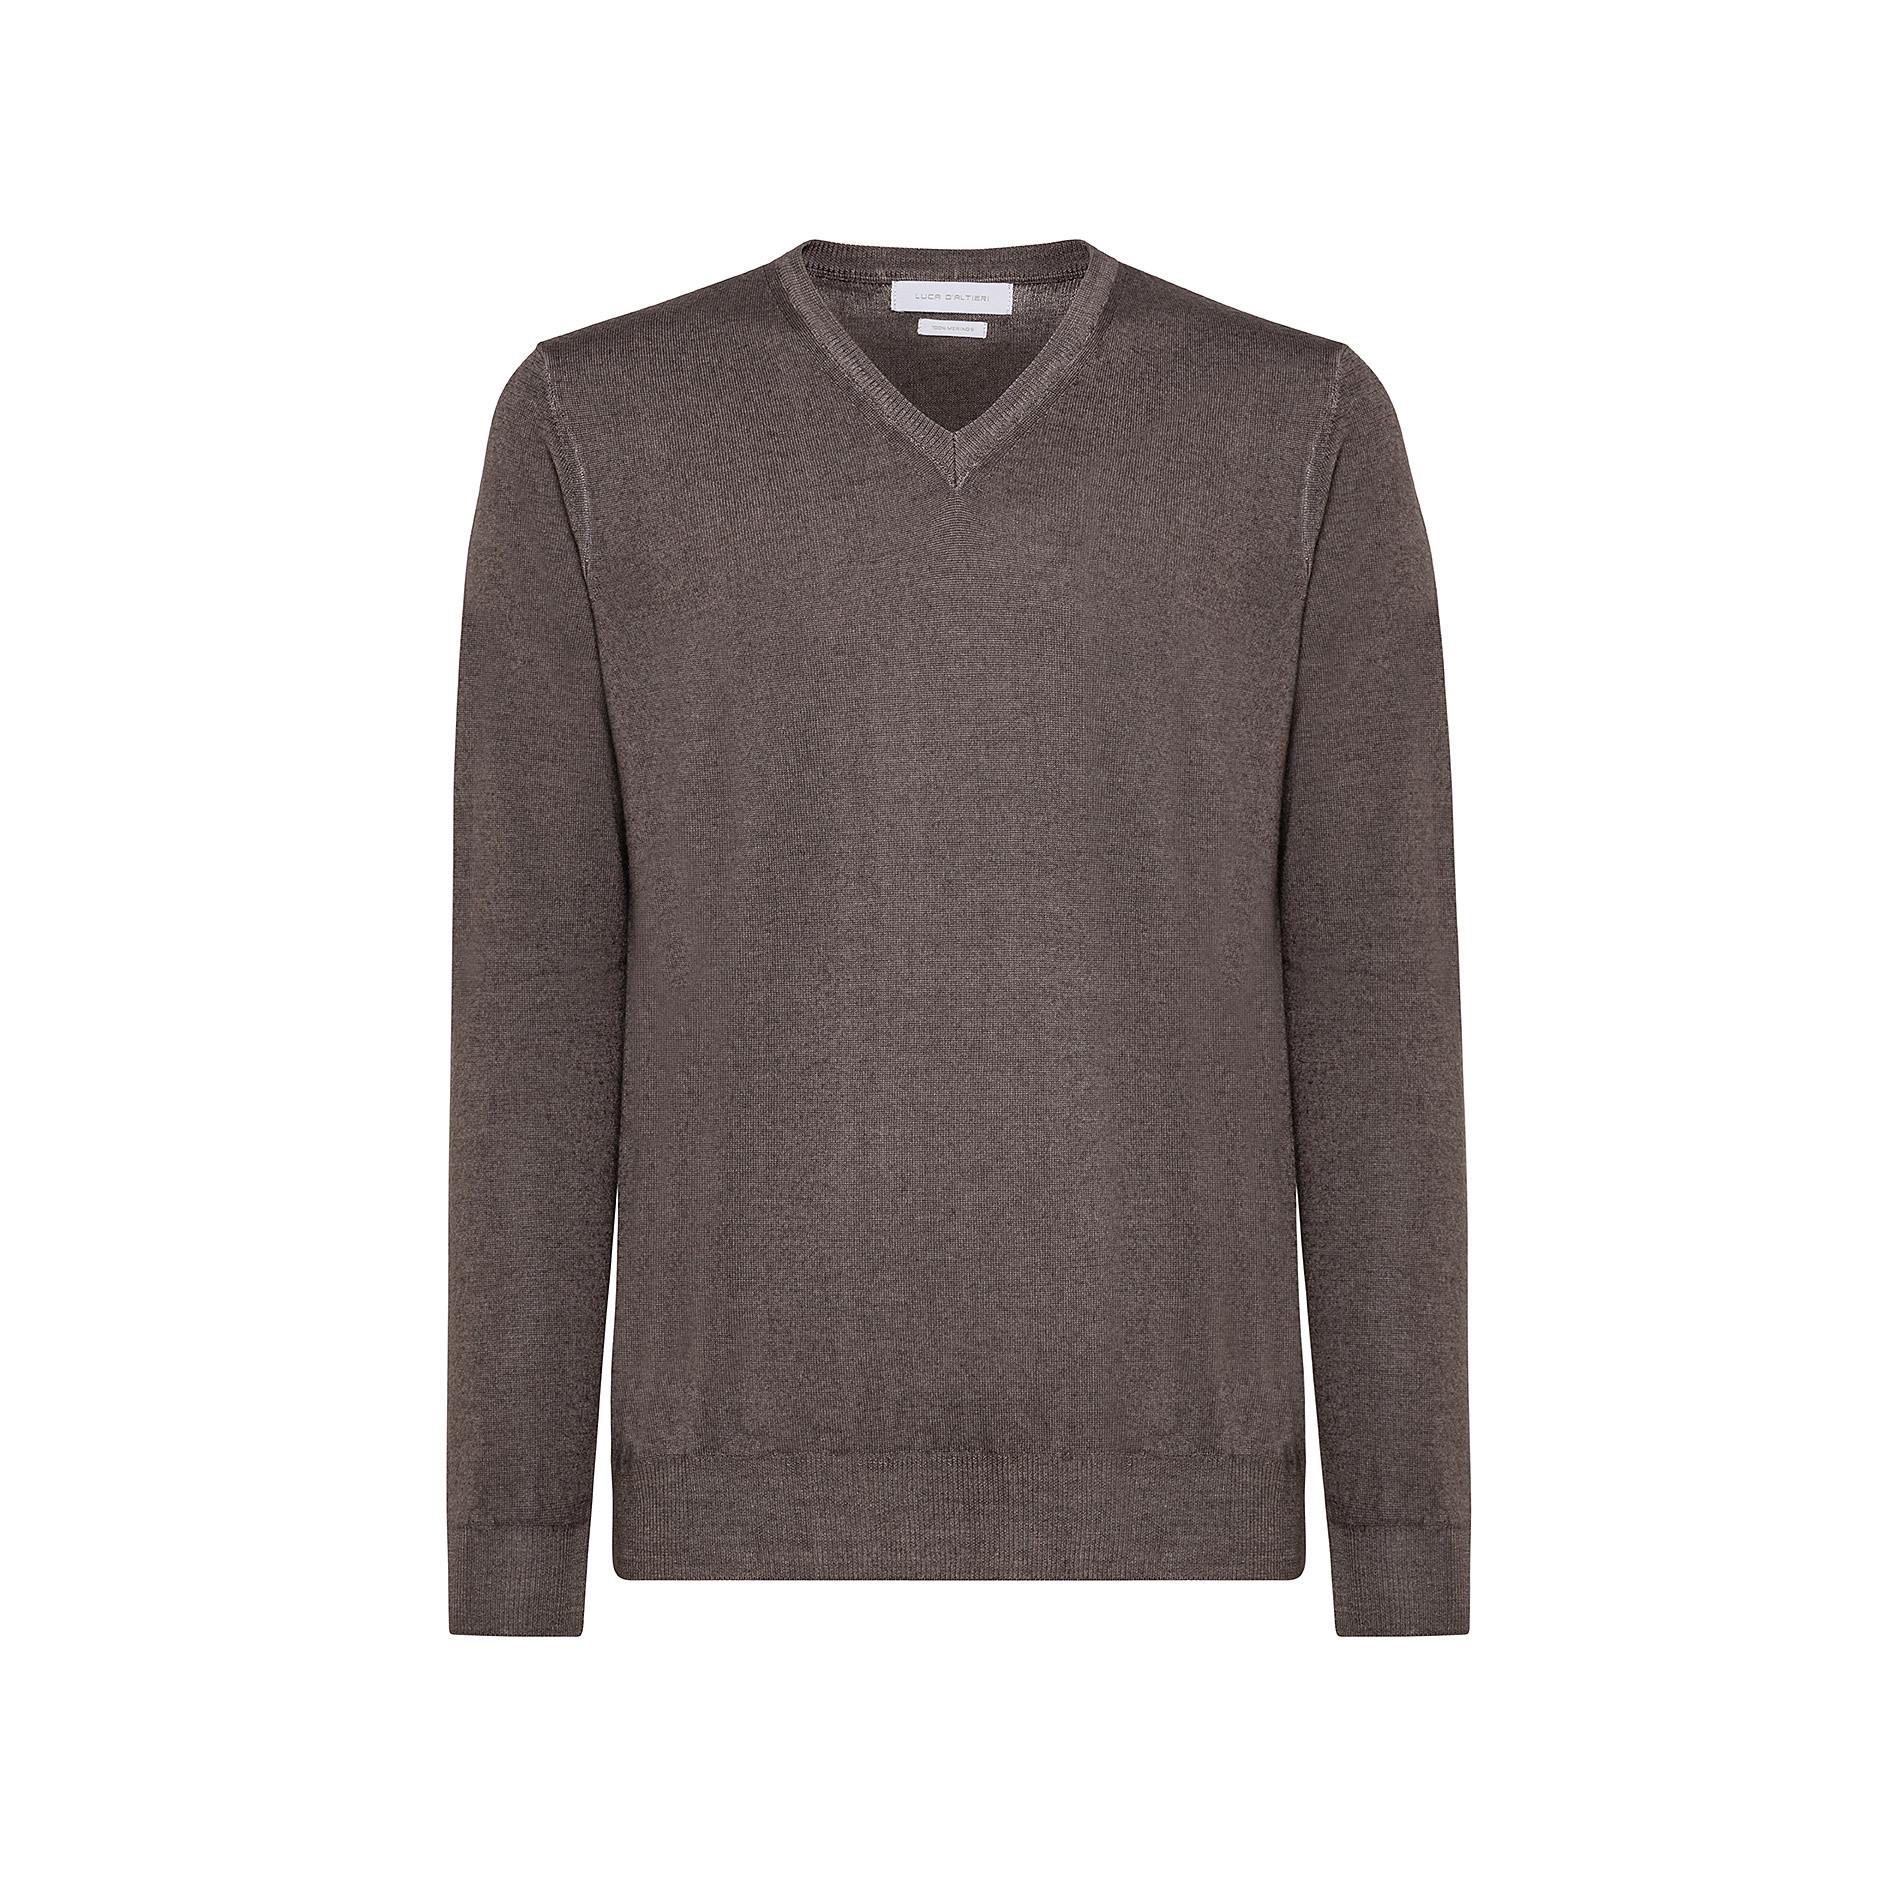 Pullover lana merinos scollo a V, Marrone scuro, large image number 0